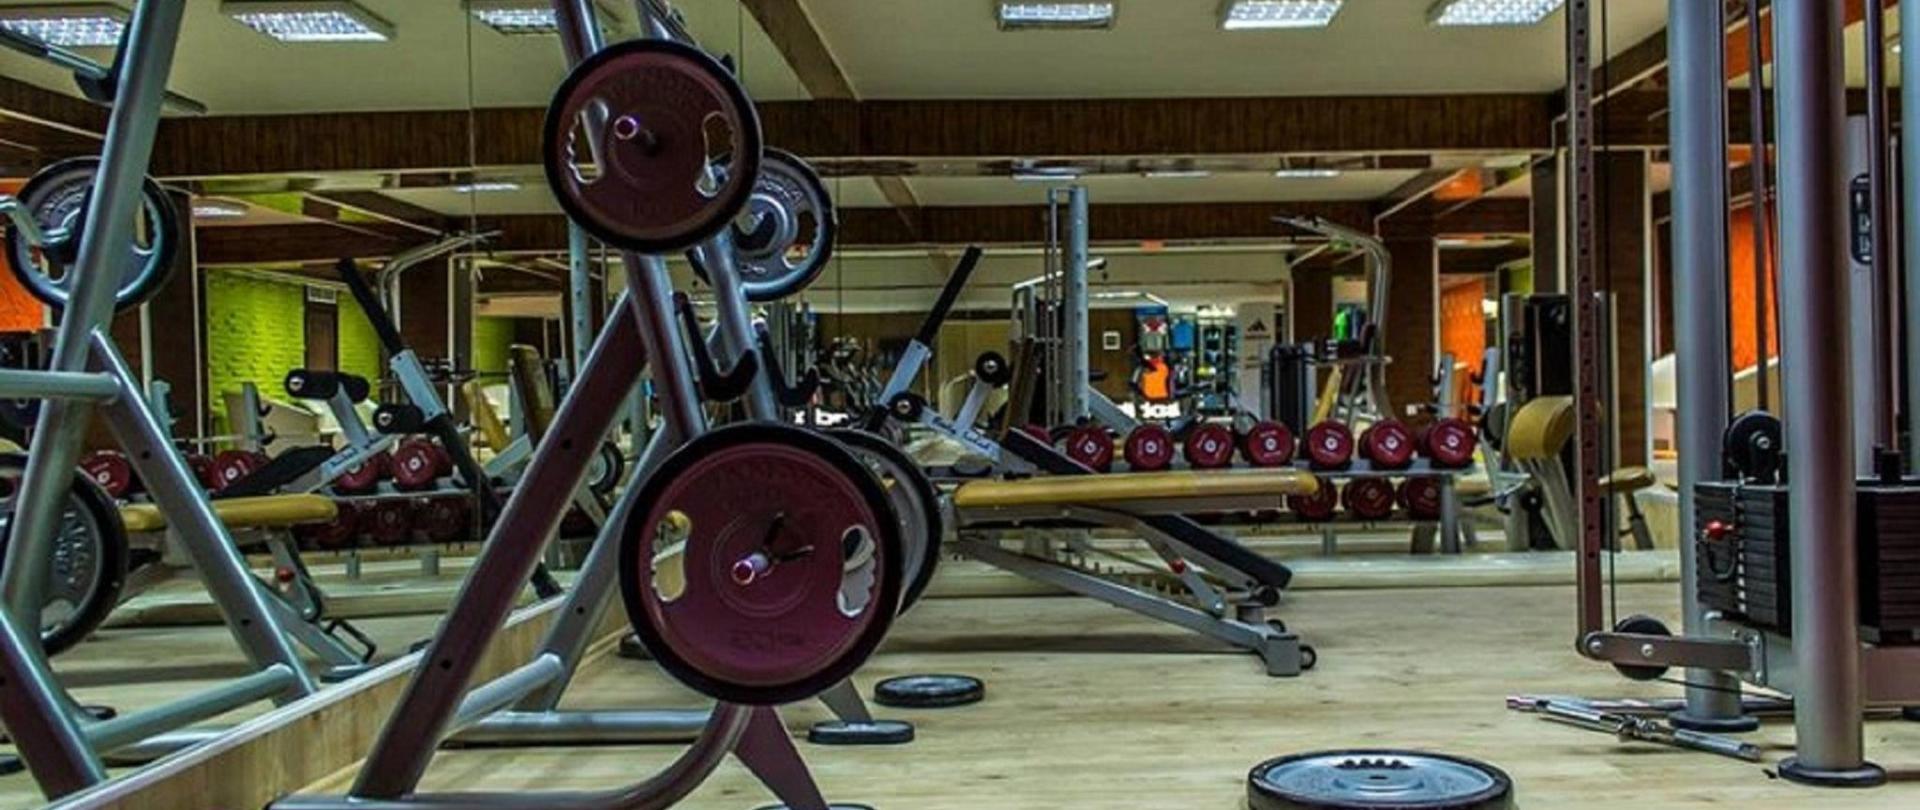 Fitnes (3).jpg